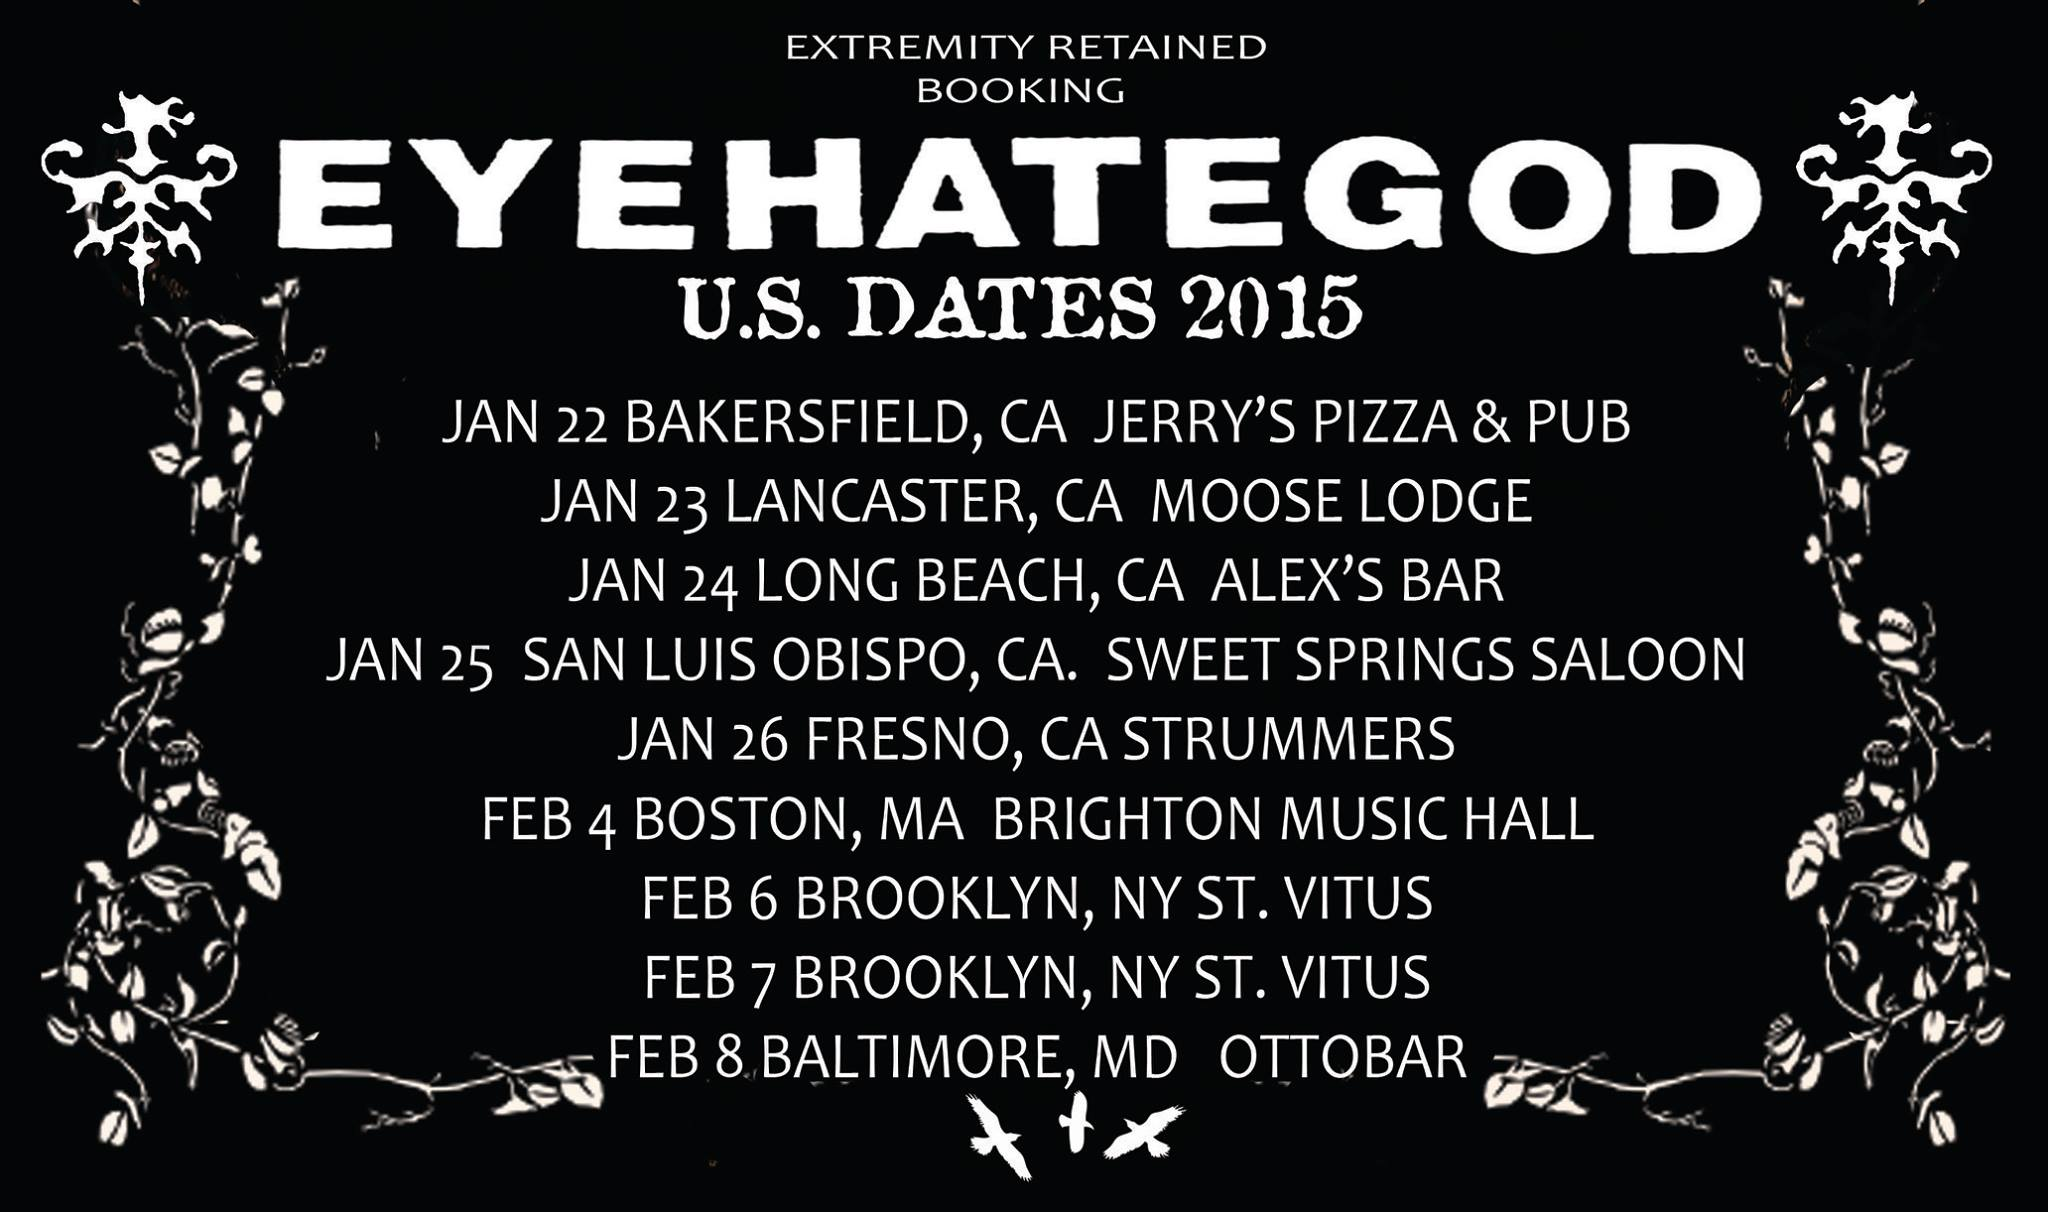 eyehategod tour